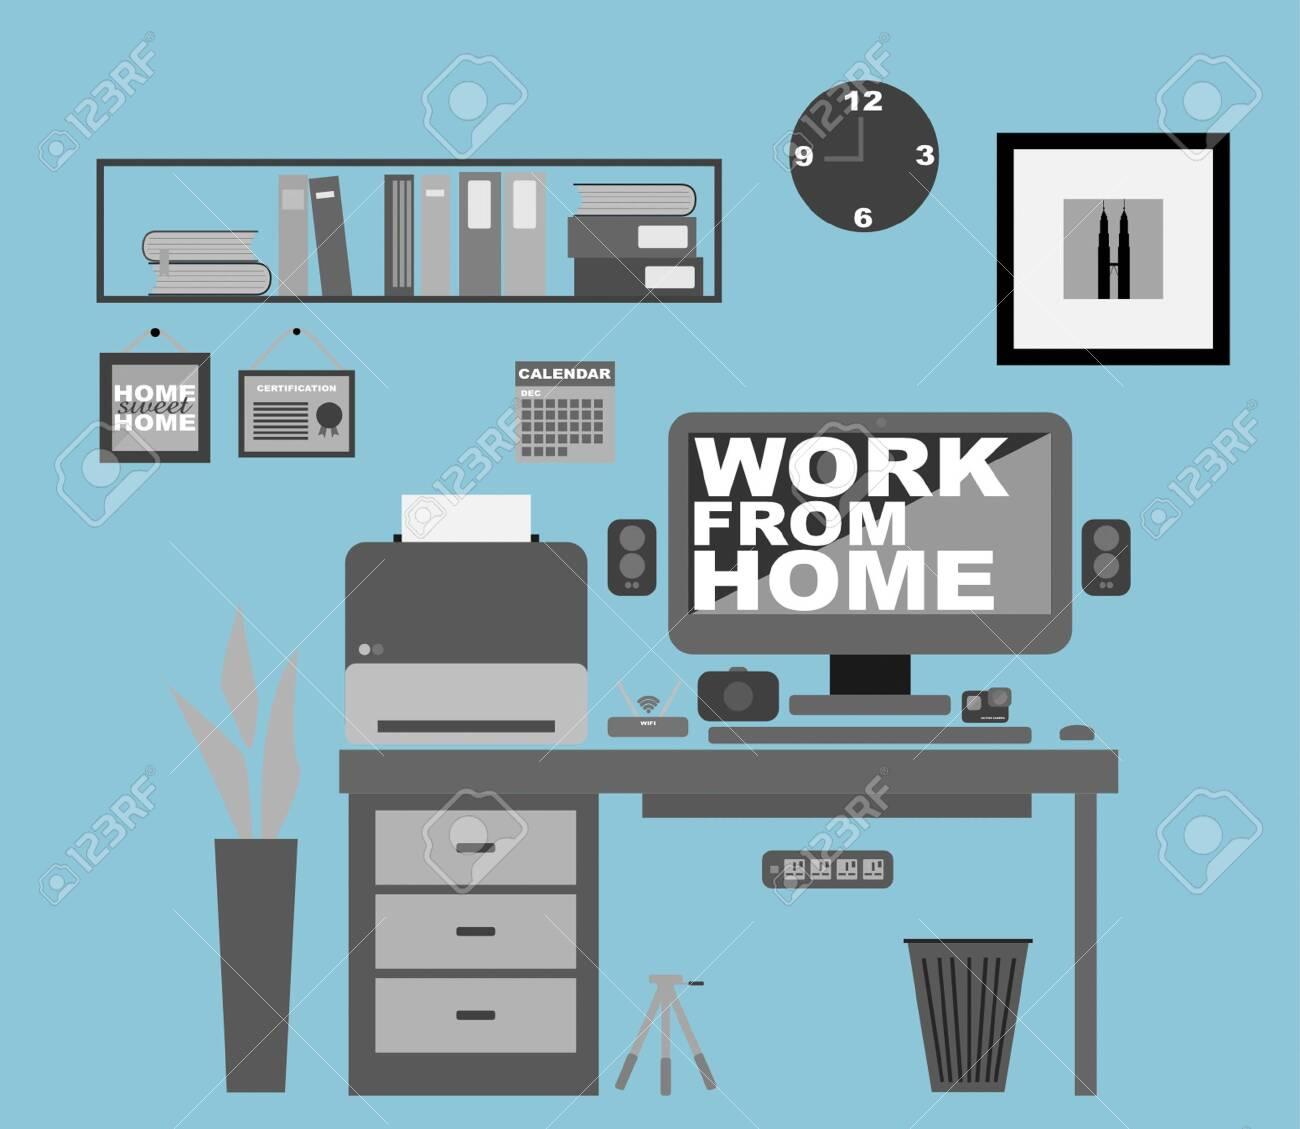 Work From Home Office Interior. Covid-19 Coronavirus Concept. Flat Vector - 144766974